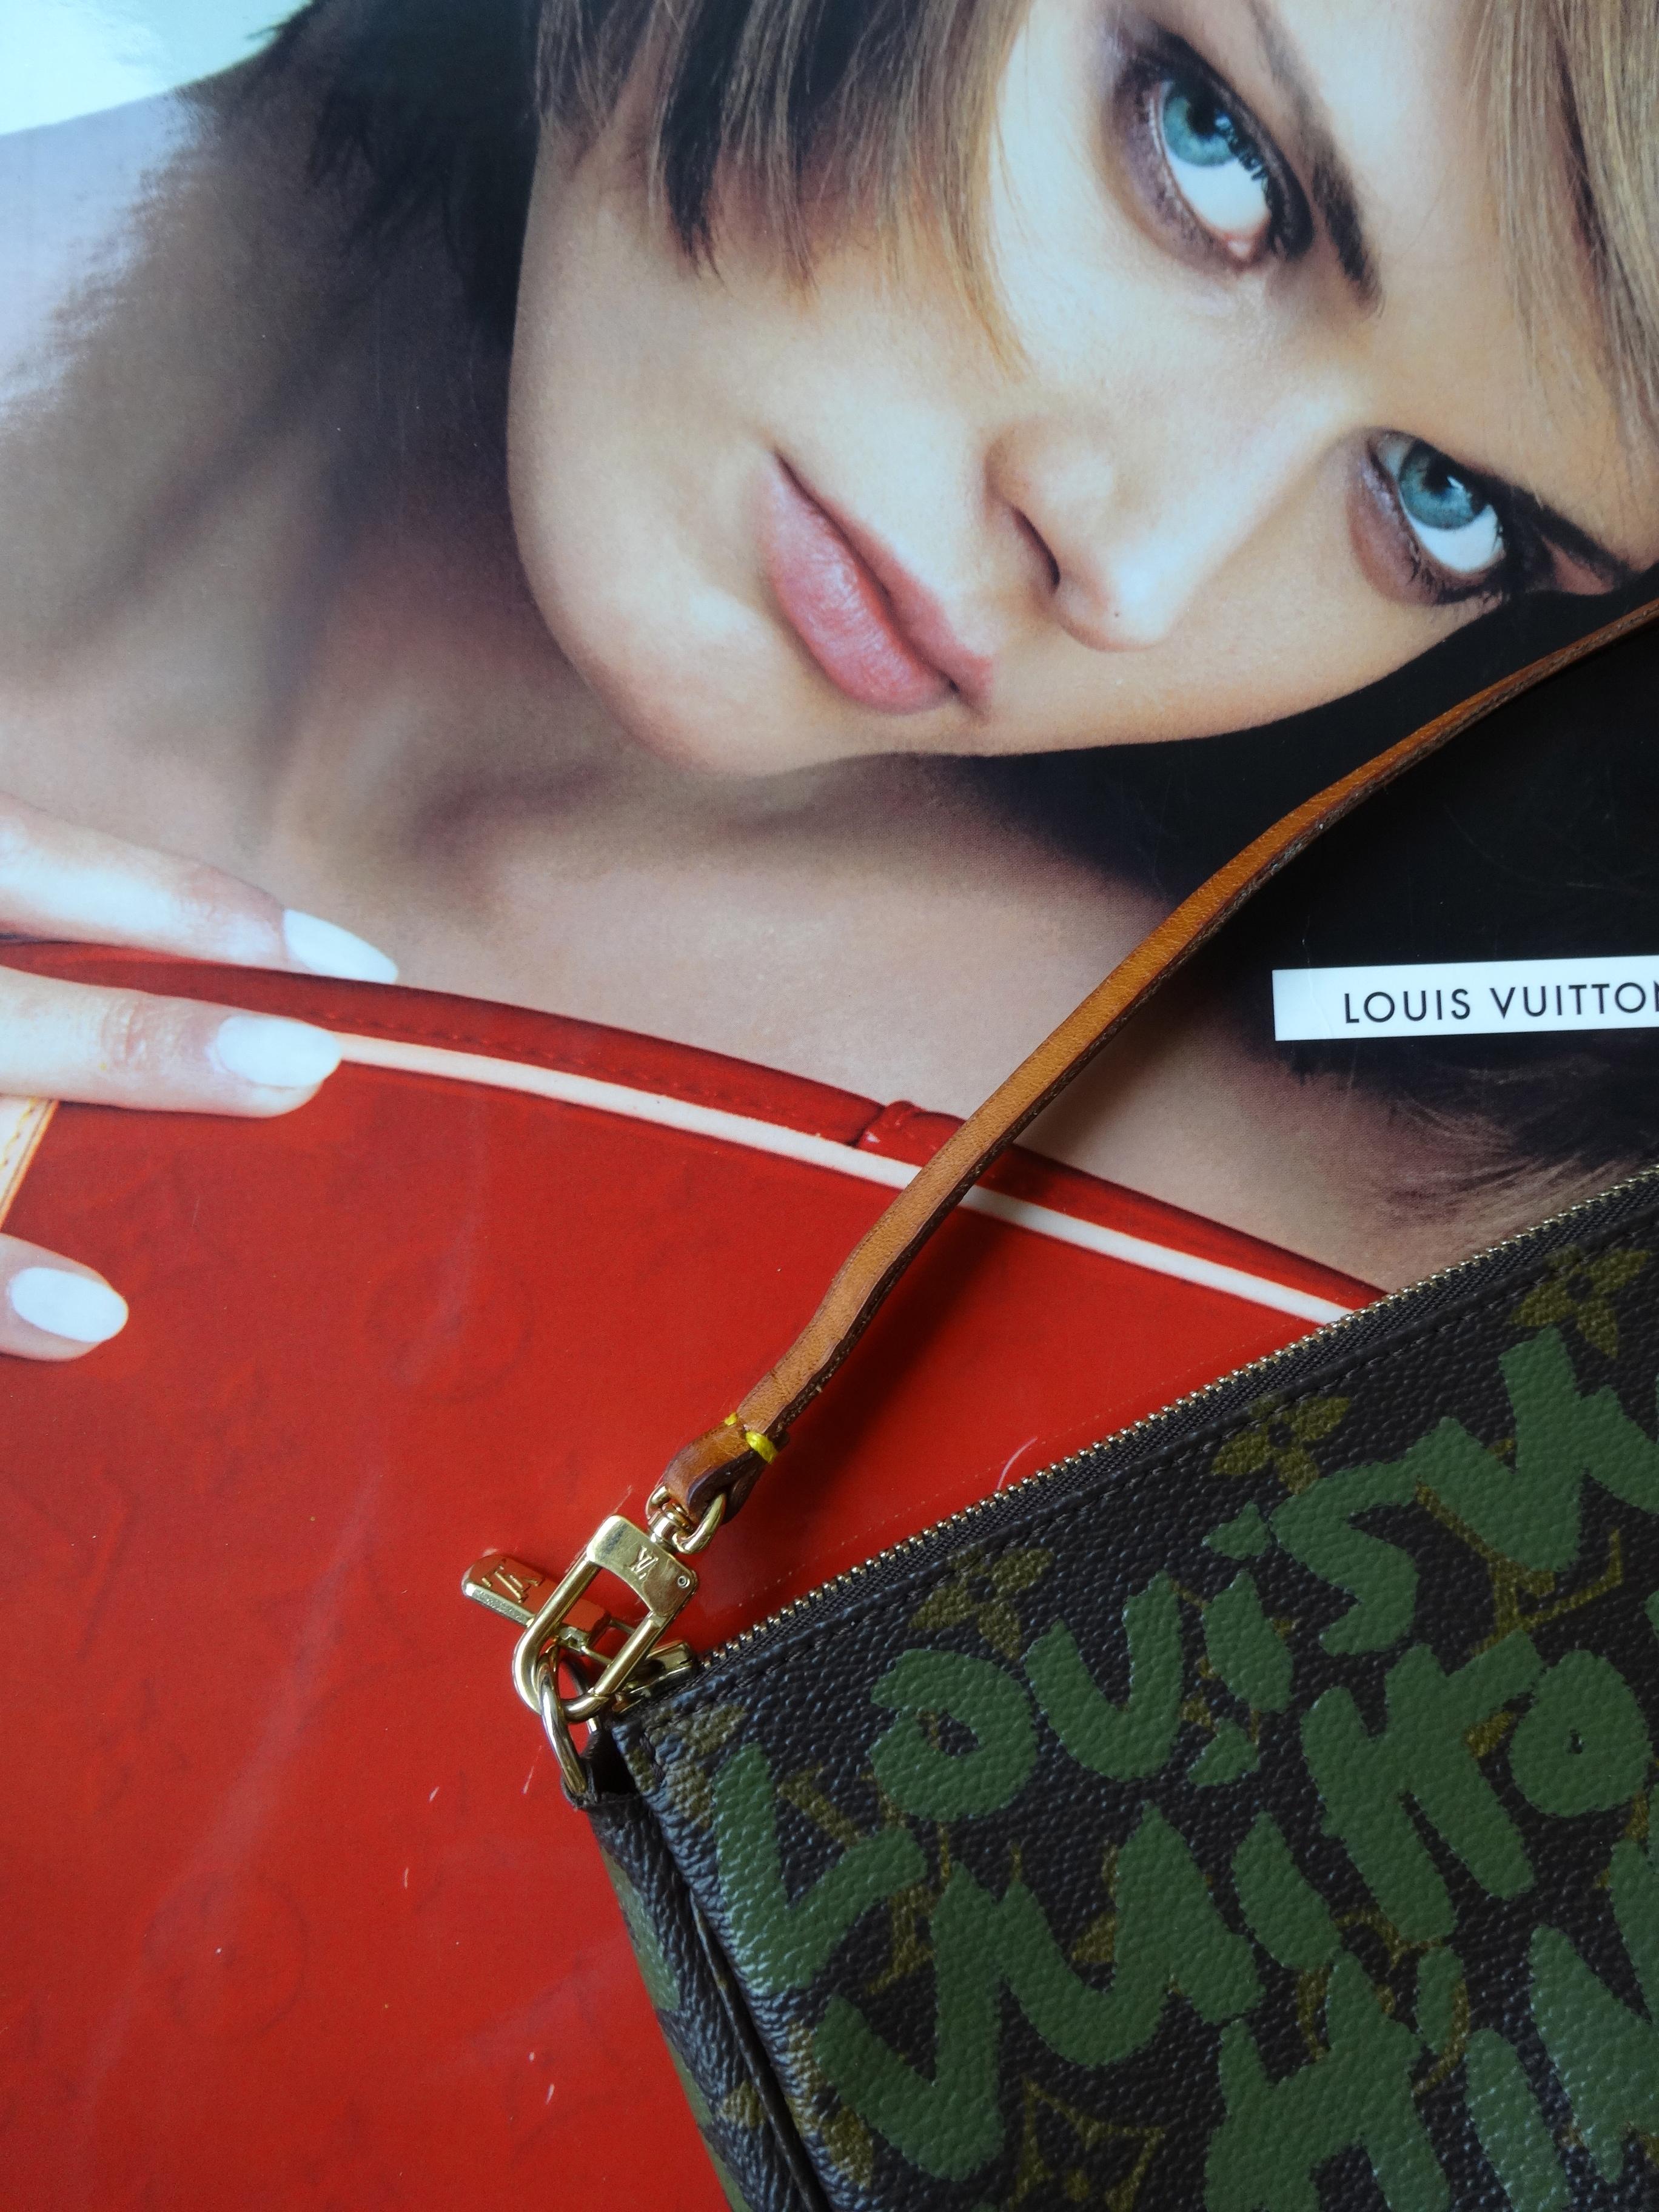 Louis Vuitton catalog